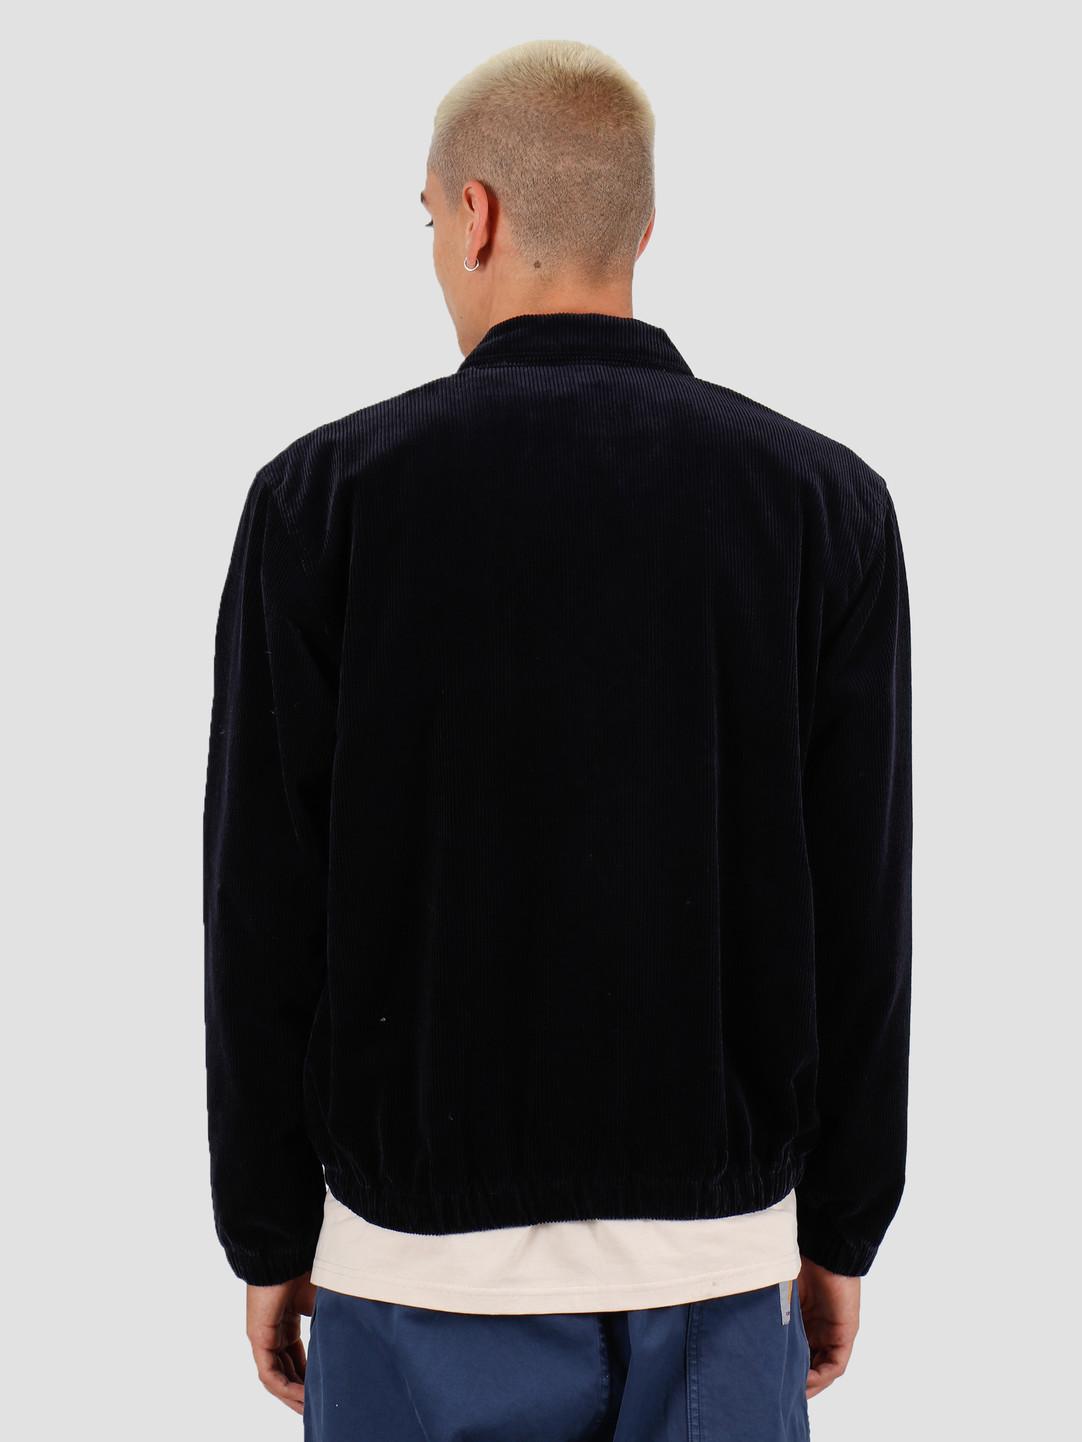 Carhartt WIP Carhartt WIP Madison Jacket Dark Navy White I027368